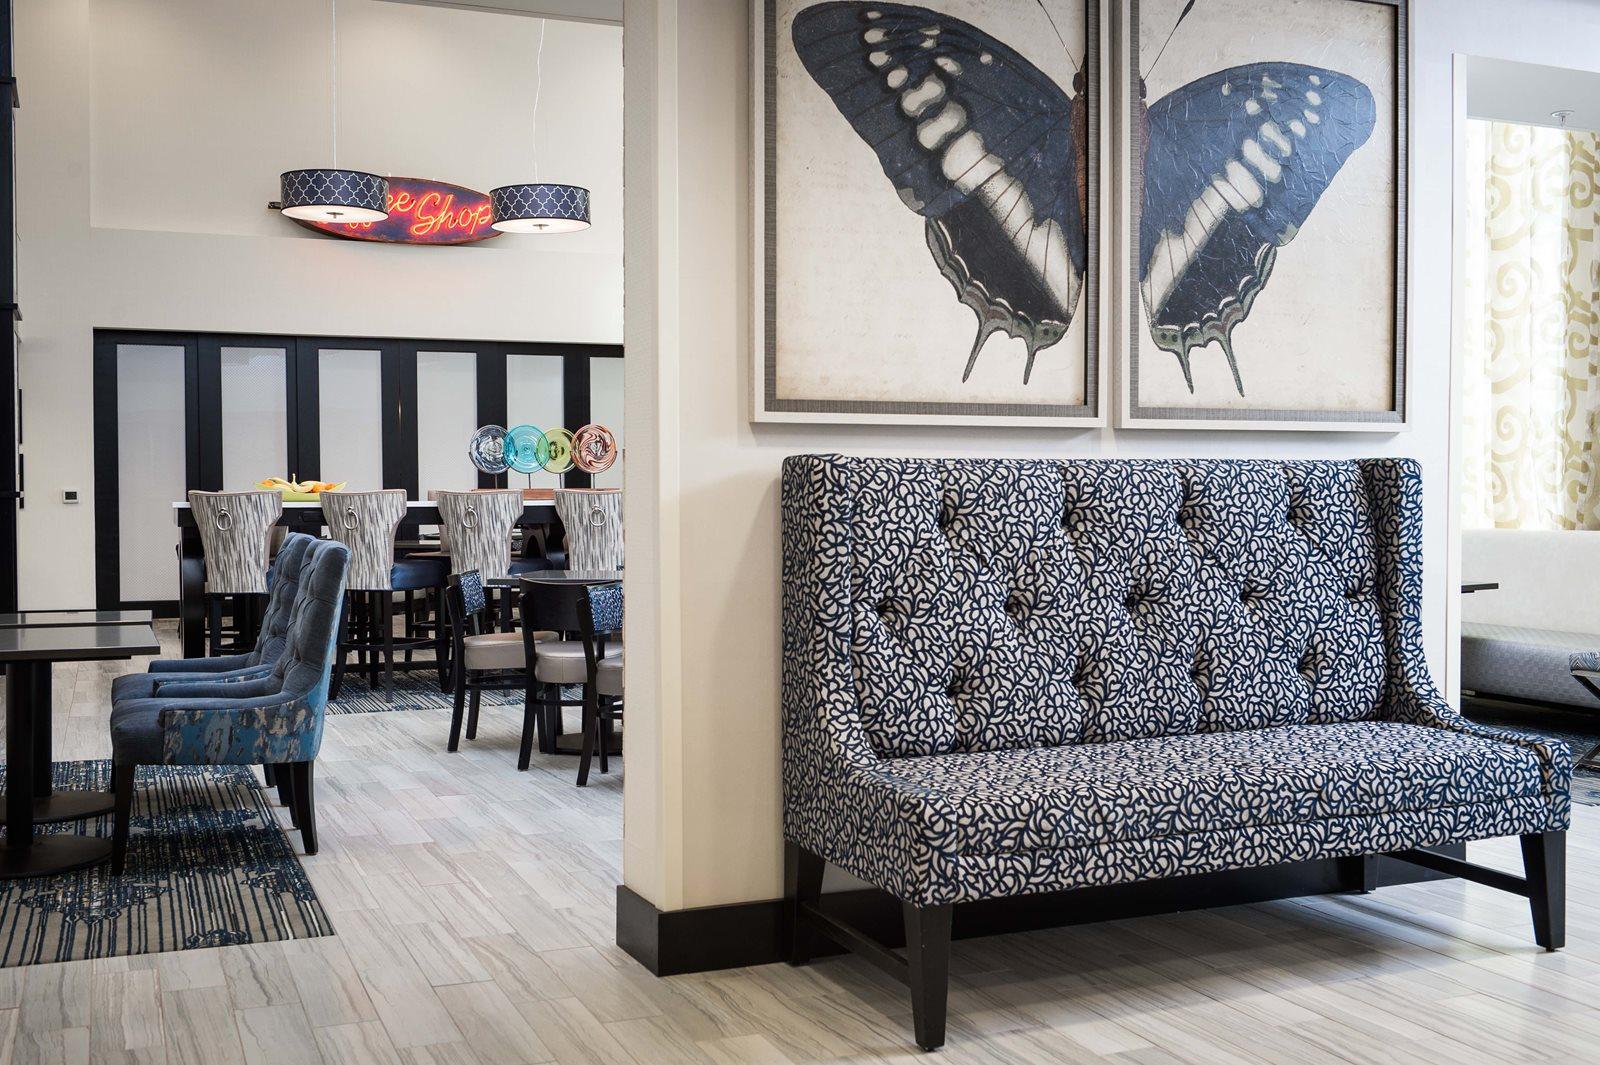 Hospitality Furnishings Design